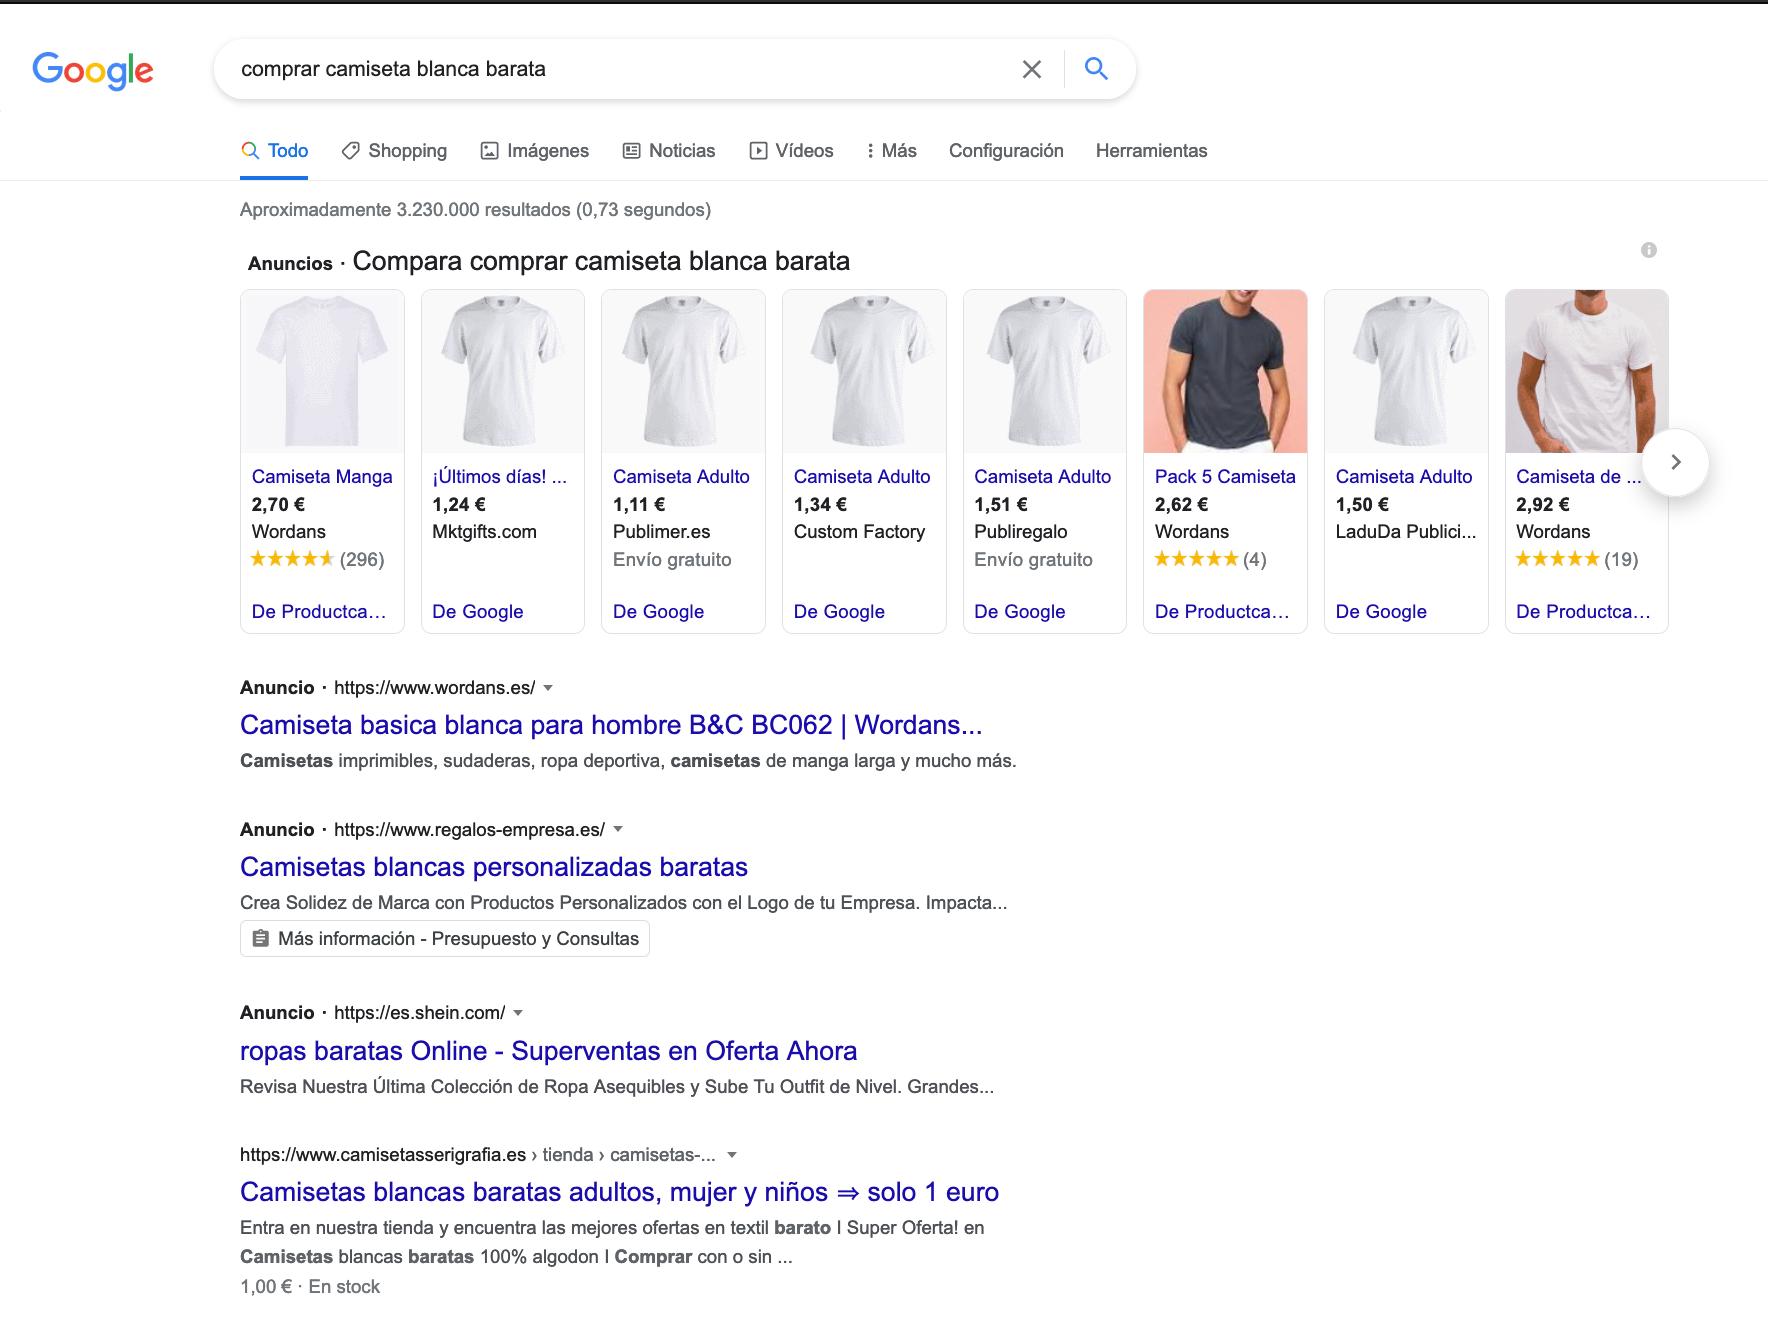 ejemplo seo comprar camiseta blanca barata